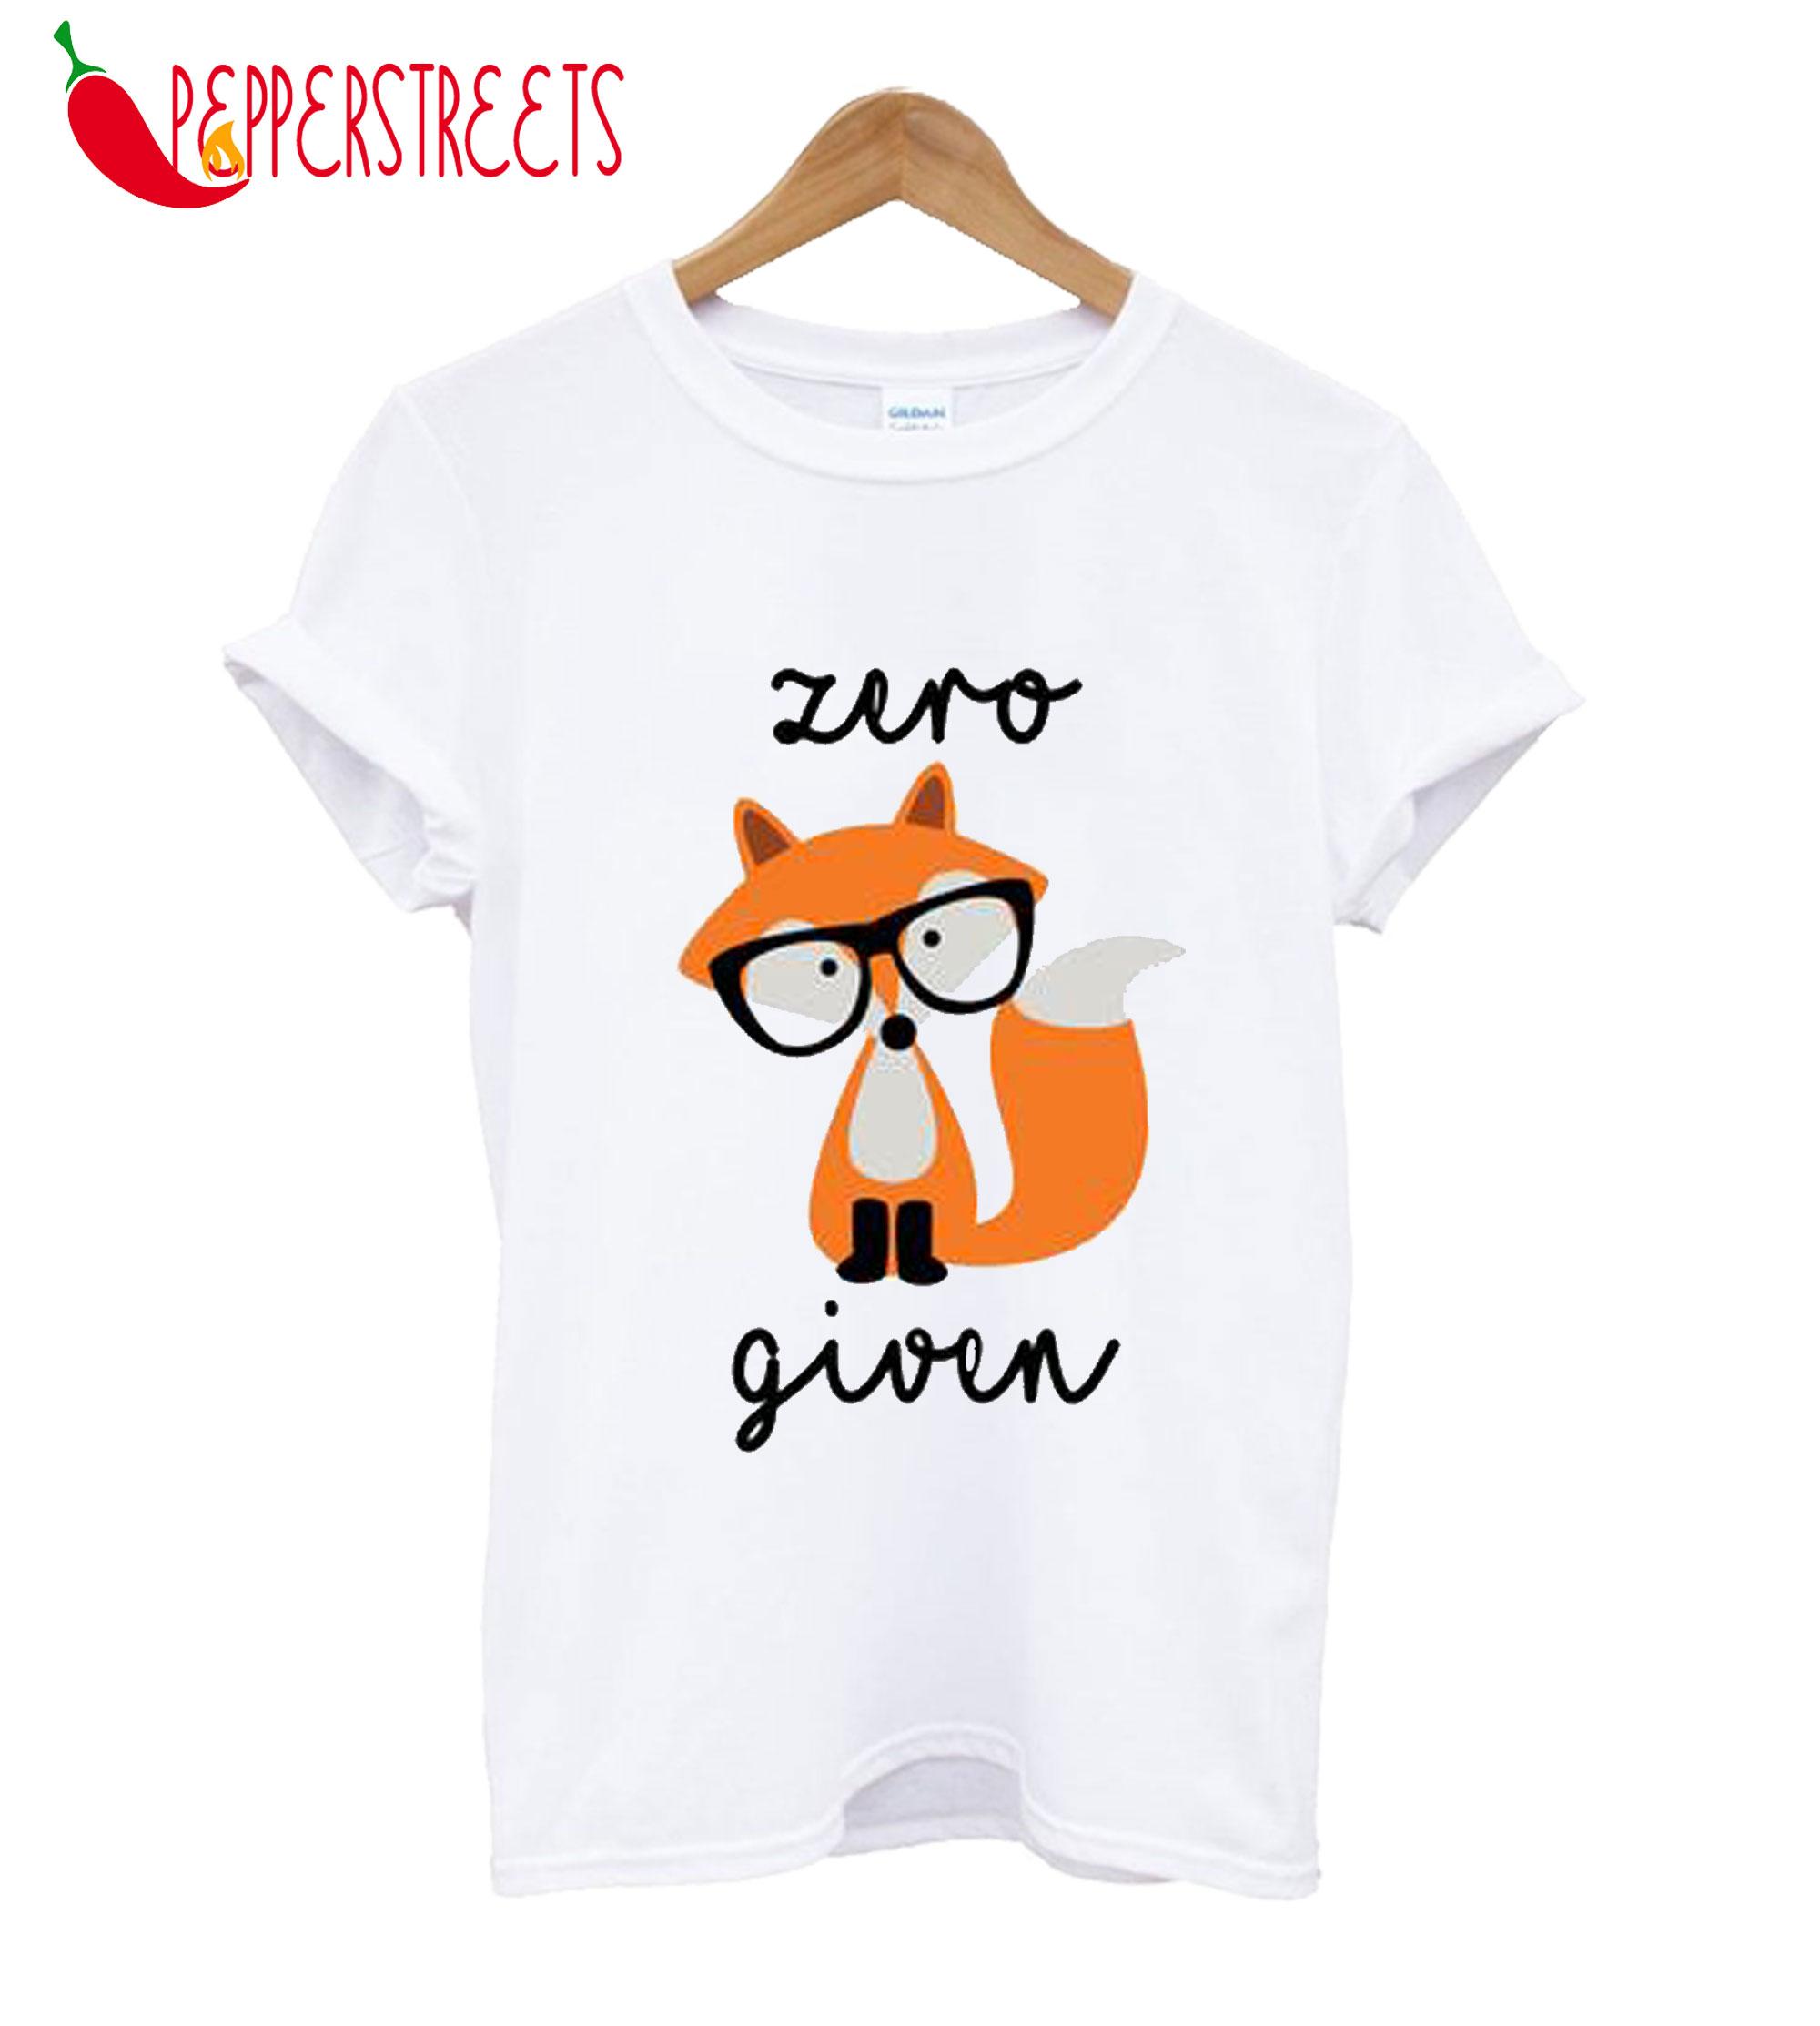 Zero Fox Given Navy Rag T-Shirt